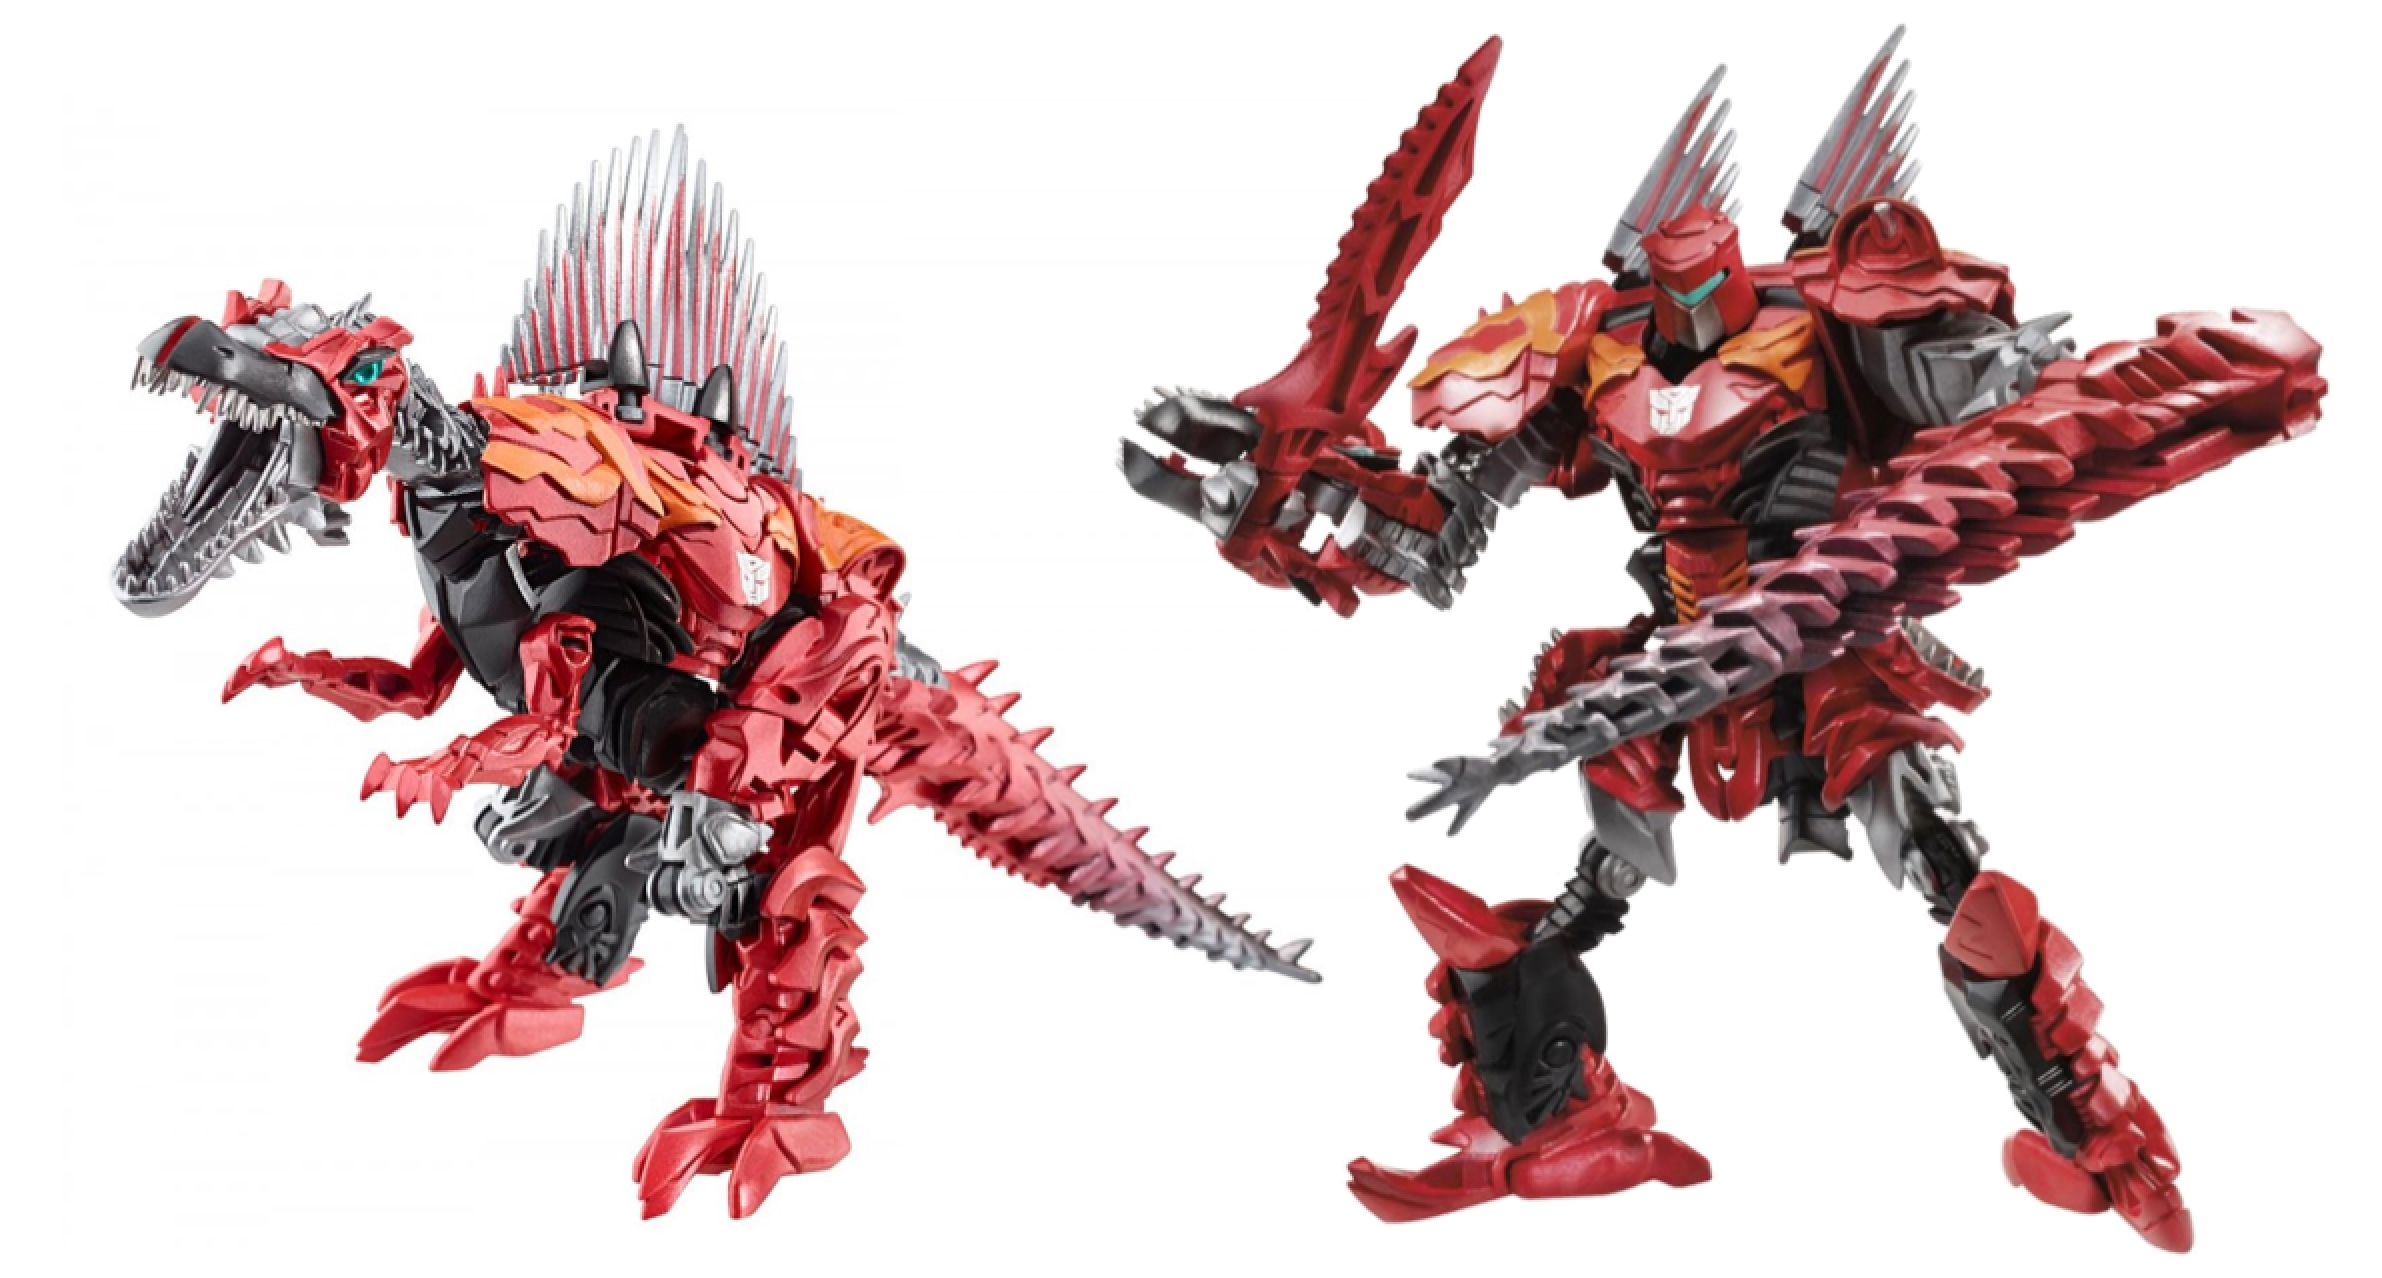 dinobot transformers scorn